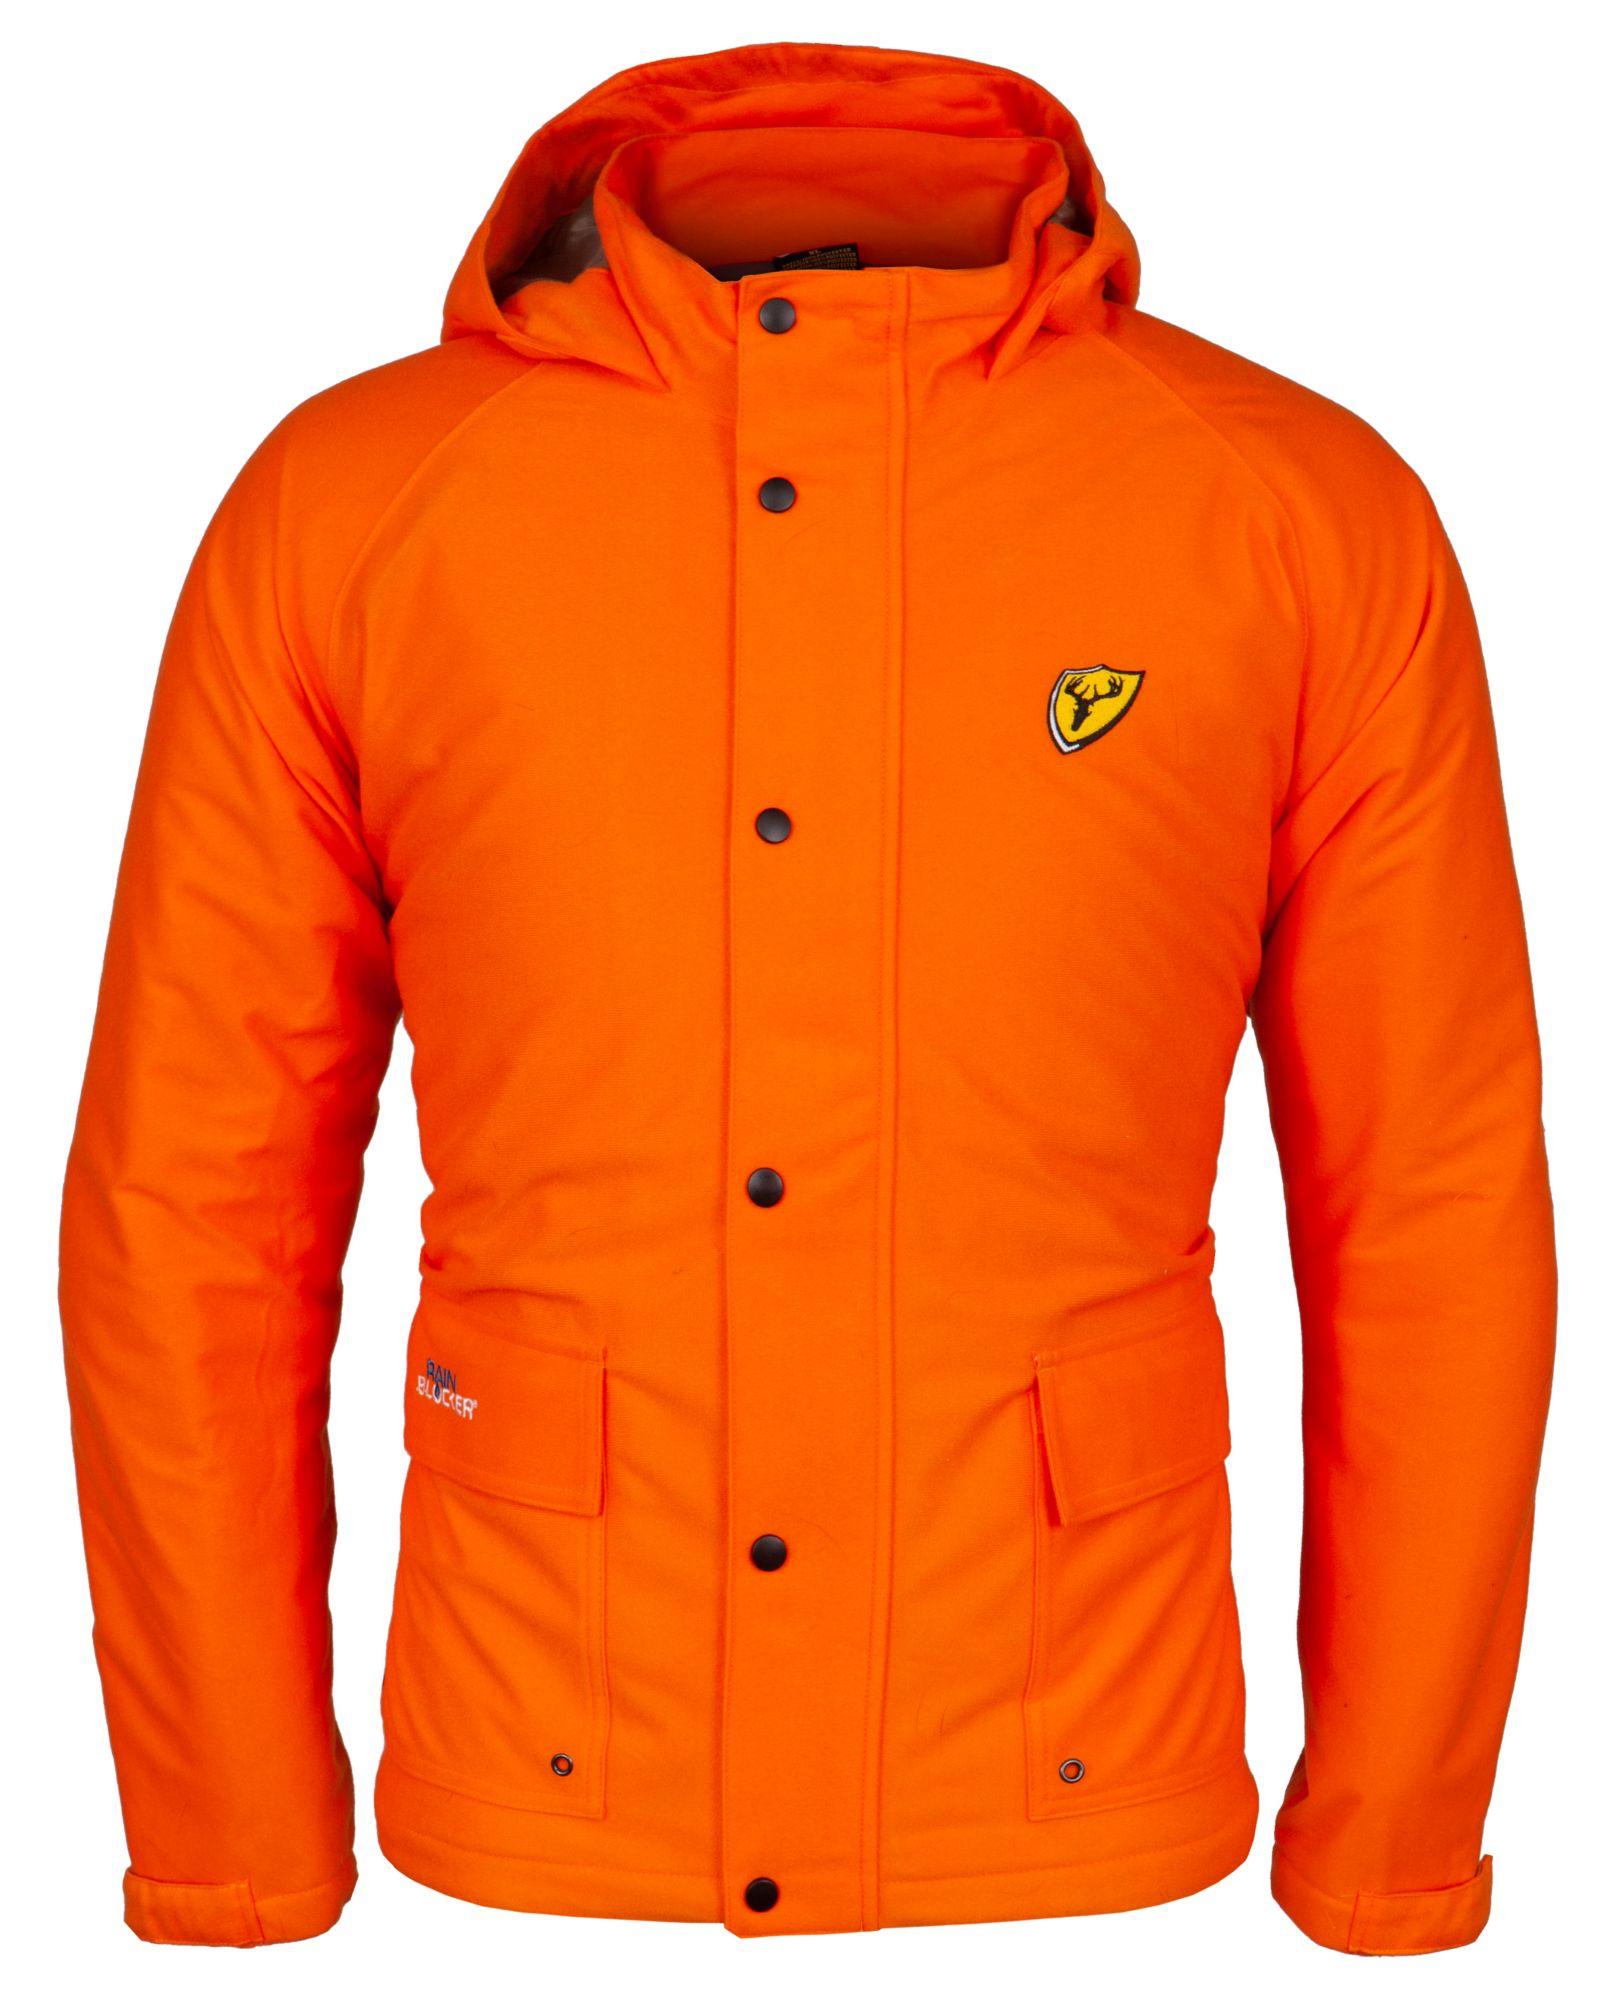 Blocker Outdoors Drencher Series Men's Insulated Jacket, XL, Blaze Orange thumbnail